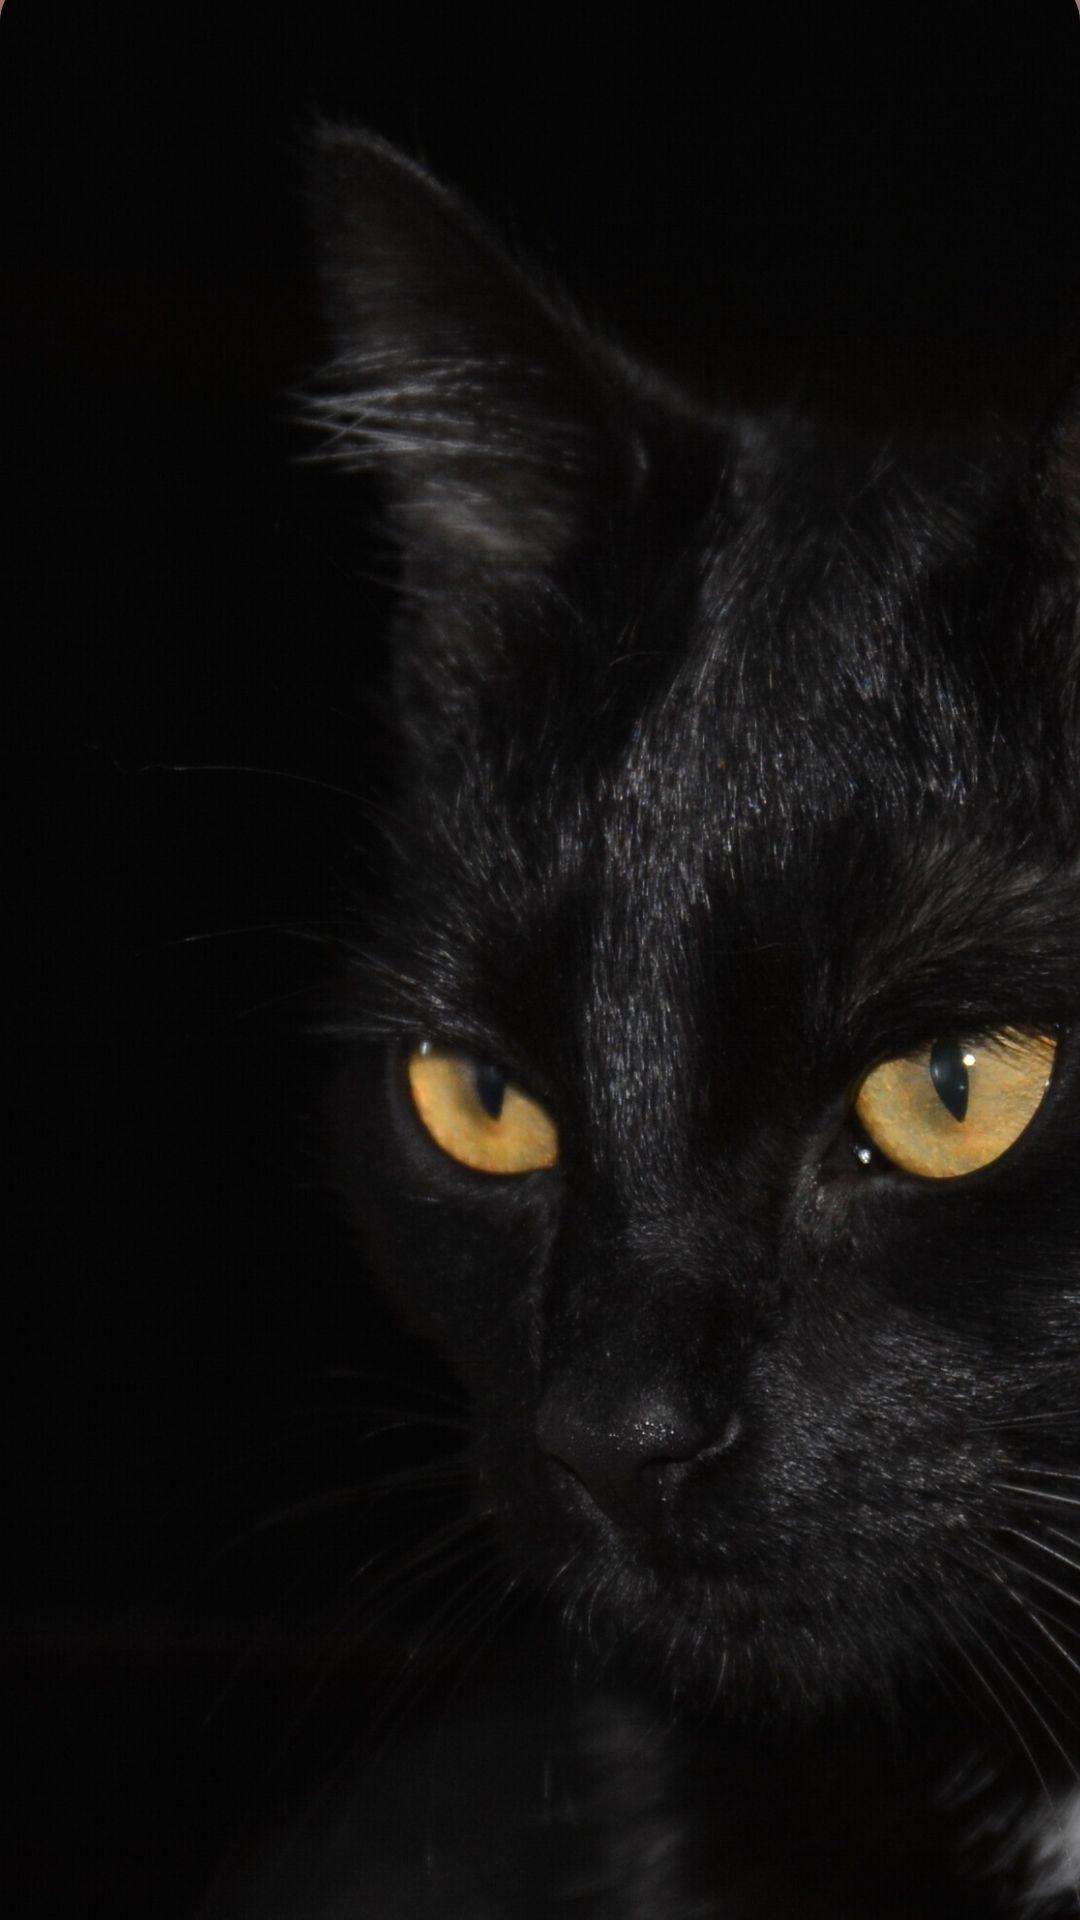 Iphone Black Cat Wallpaper Cute Cat Wallpaper Black Cat Pictures Black Cat Drawing